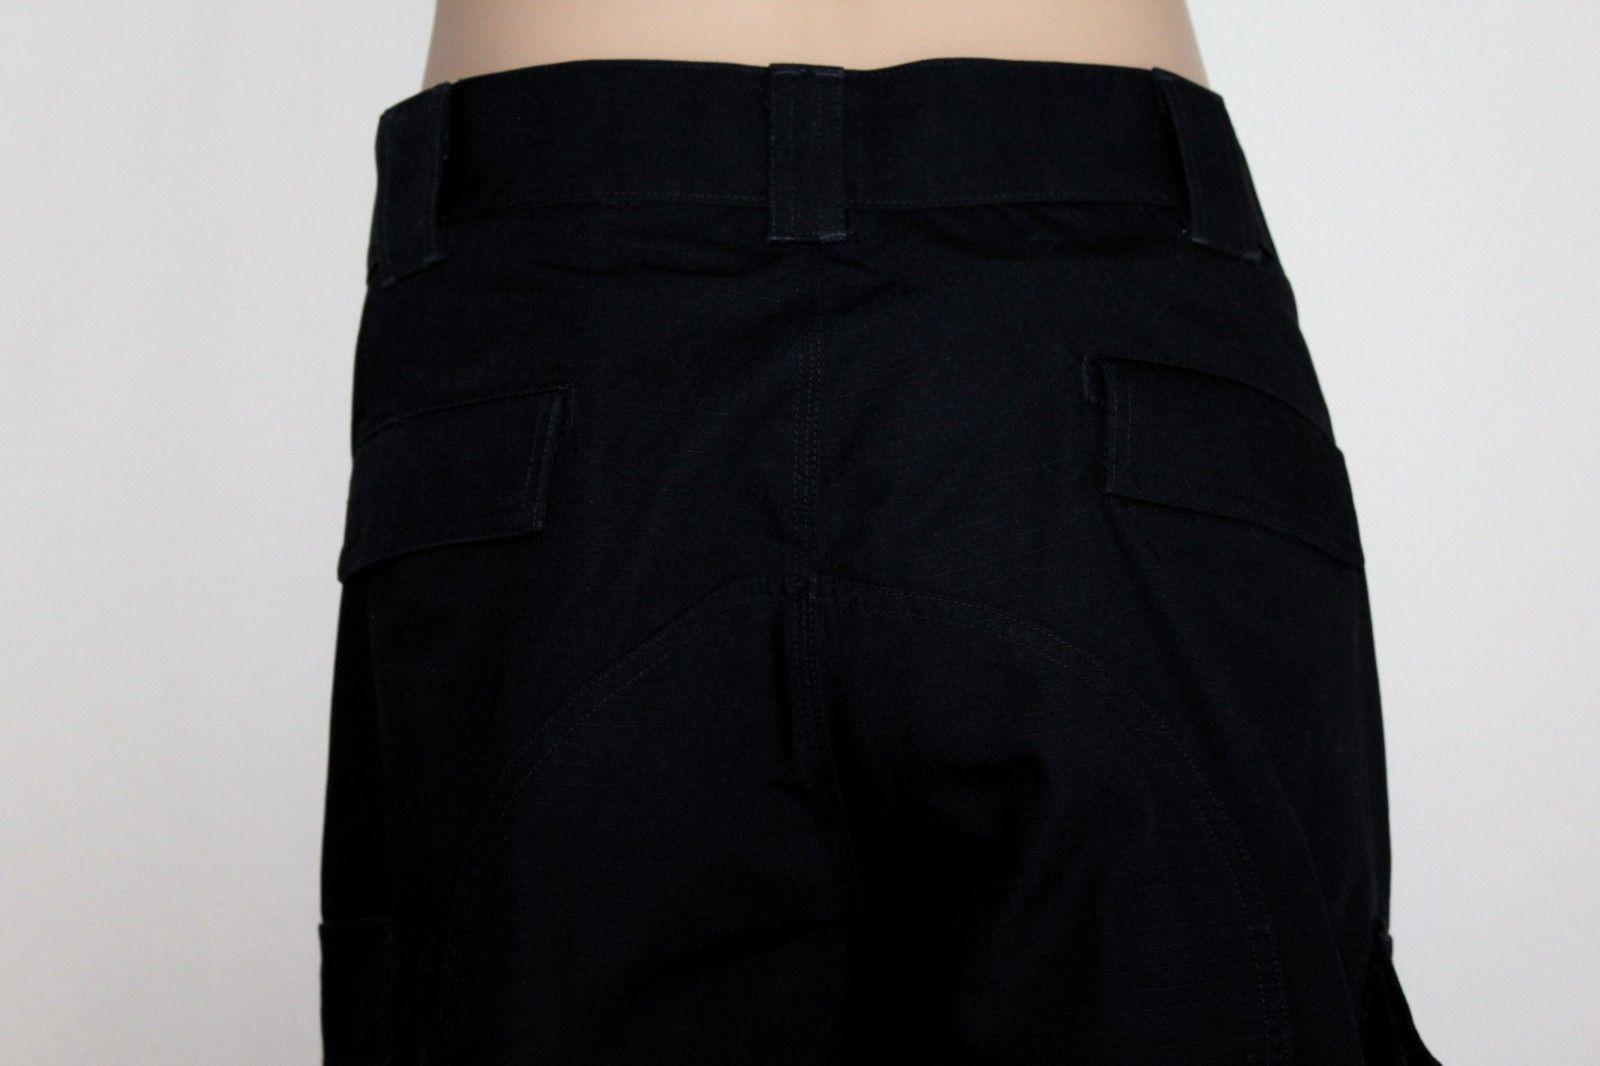 5.11 Tactical Series 74003 Size  2X-Large(43 1/2-47) Black Cargo Pants EUC